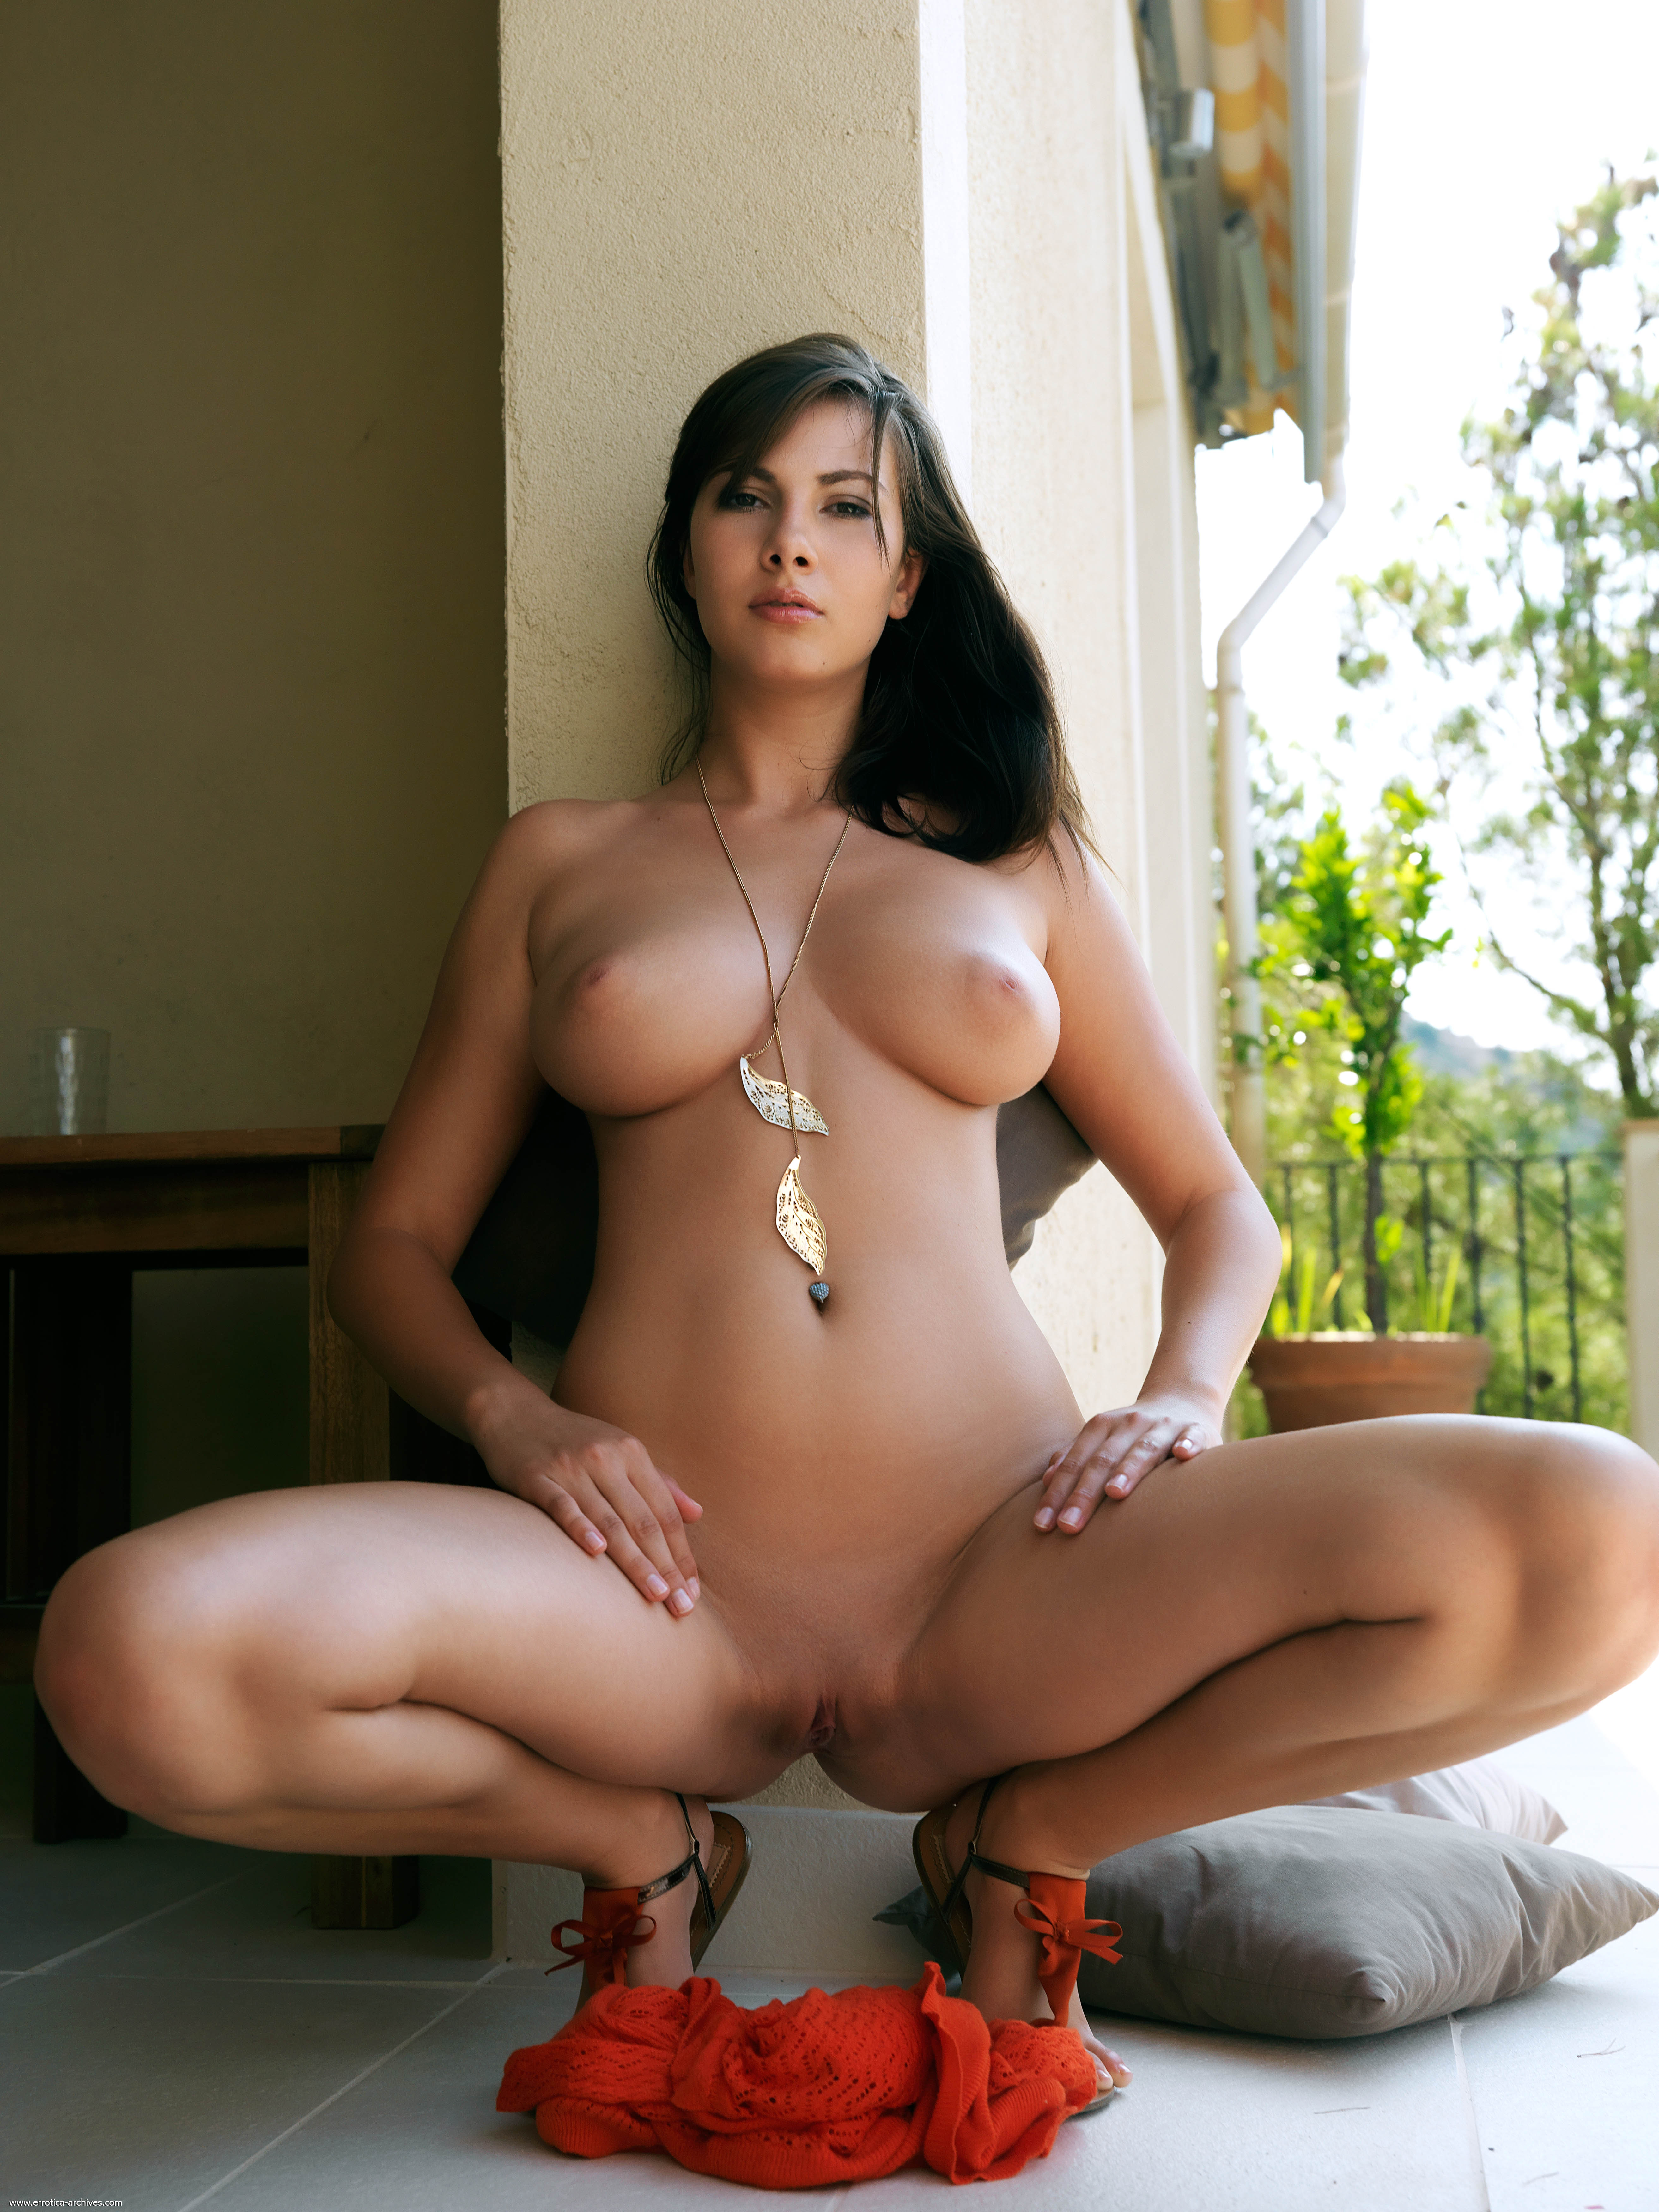 image Super hot soccer mom rides her dildo